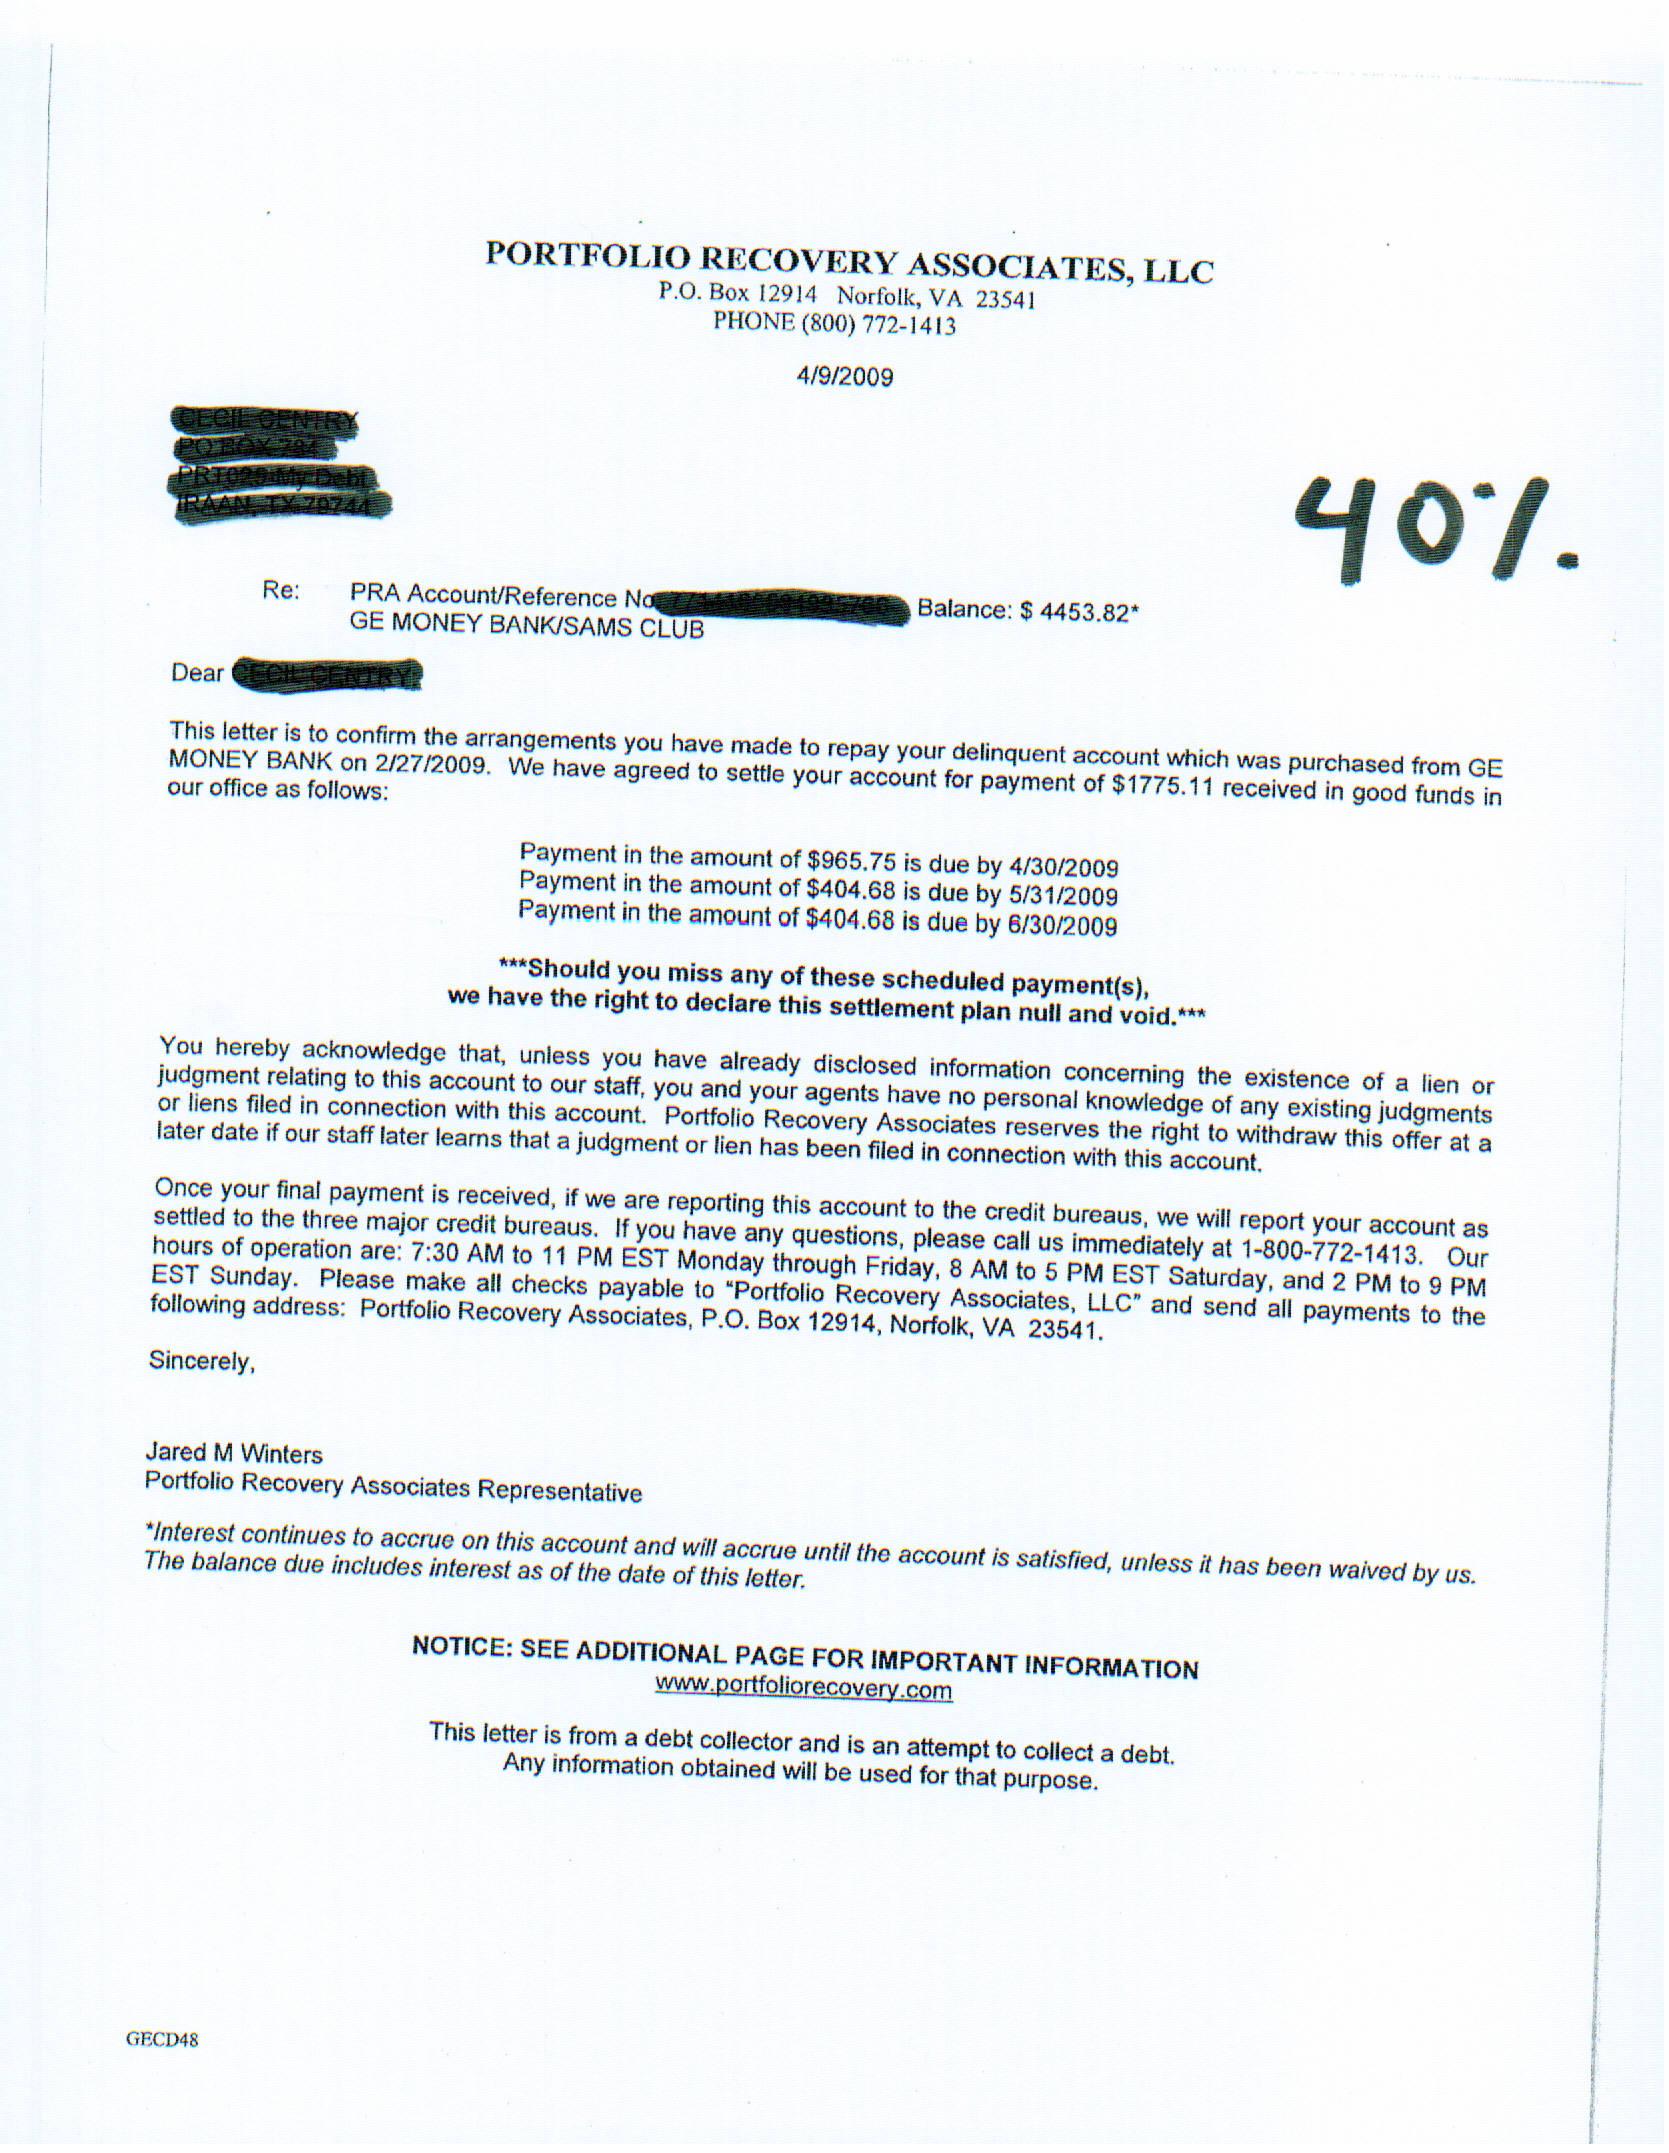 Payday loans in warrenton va image 5